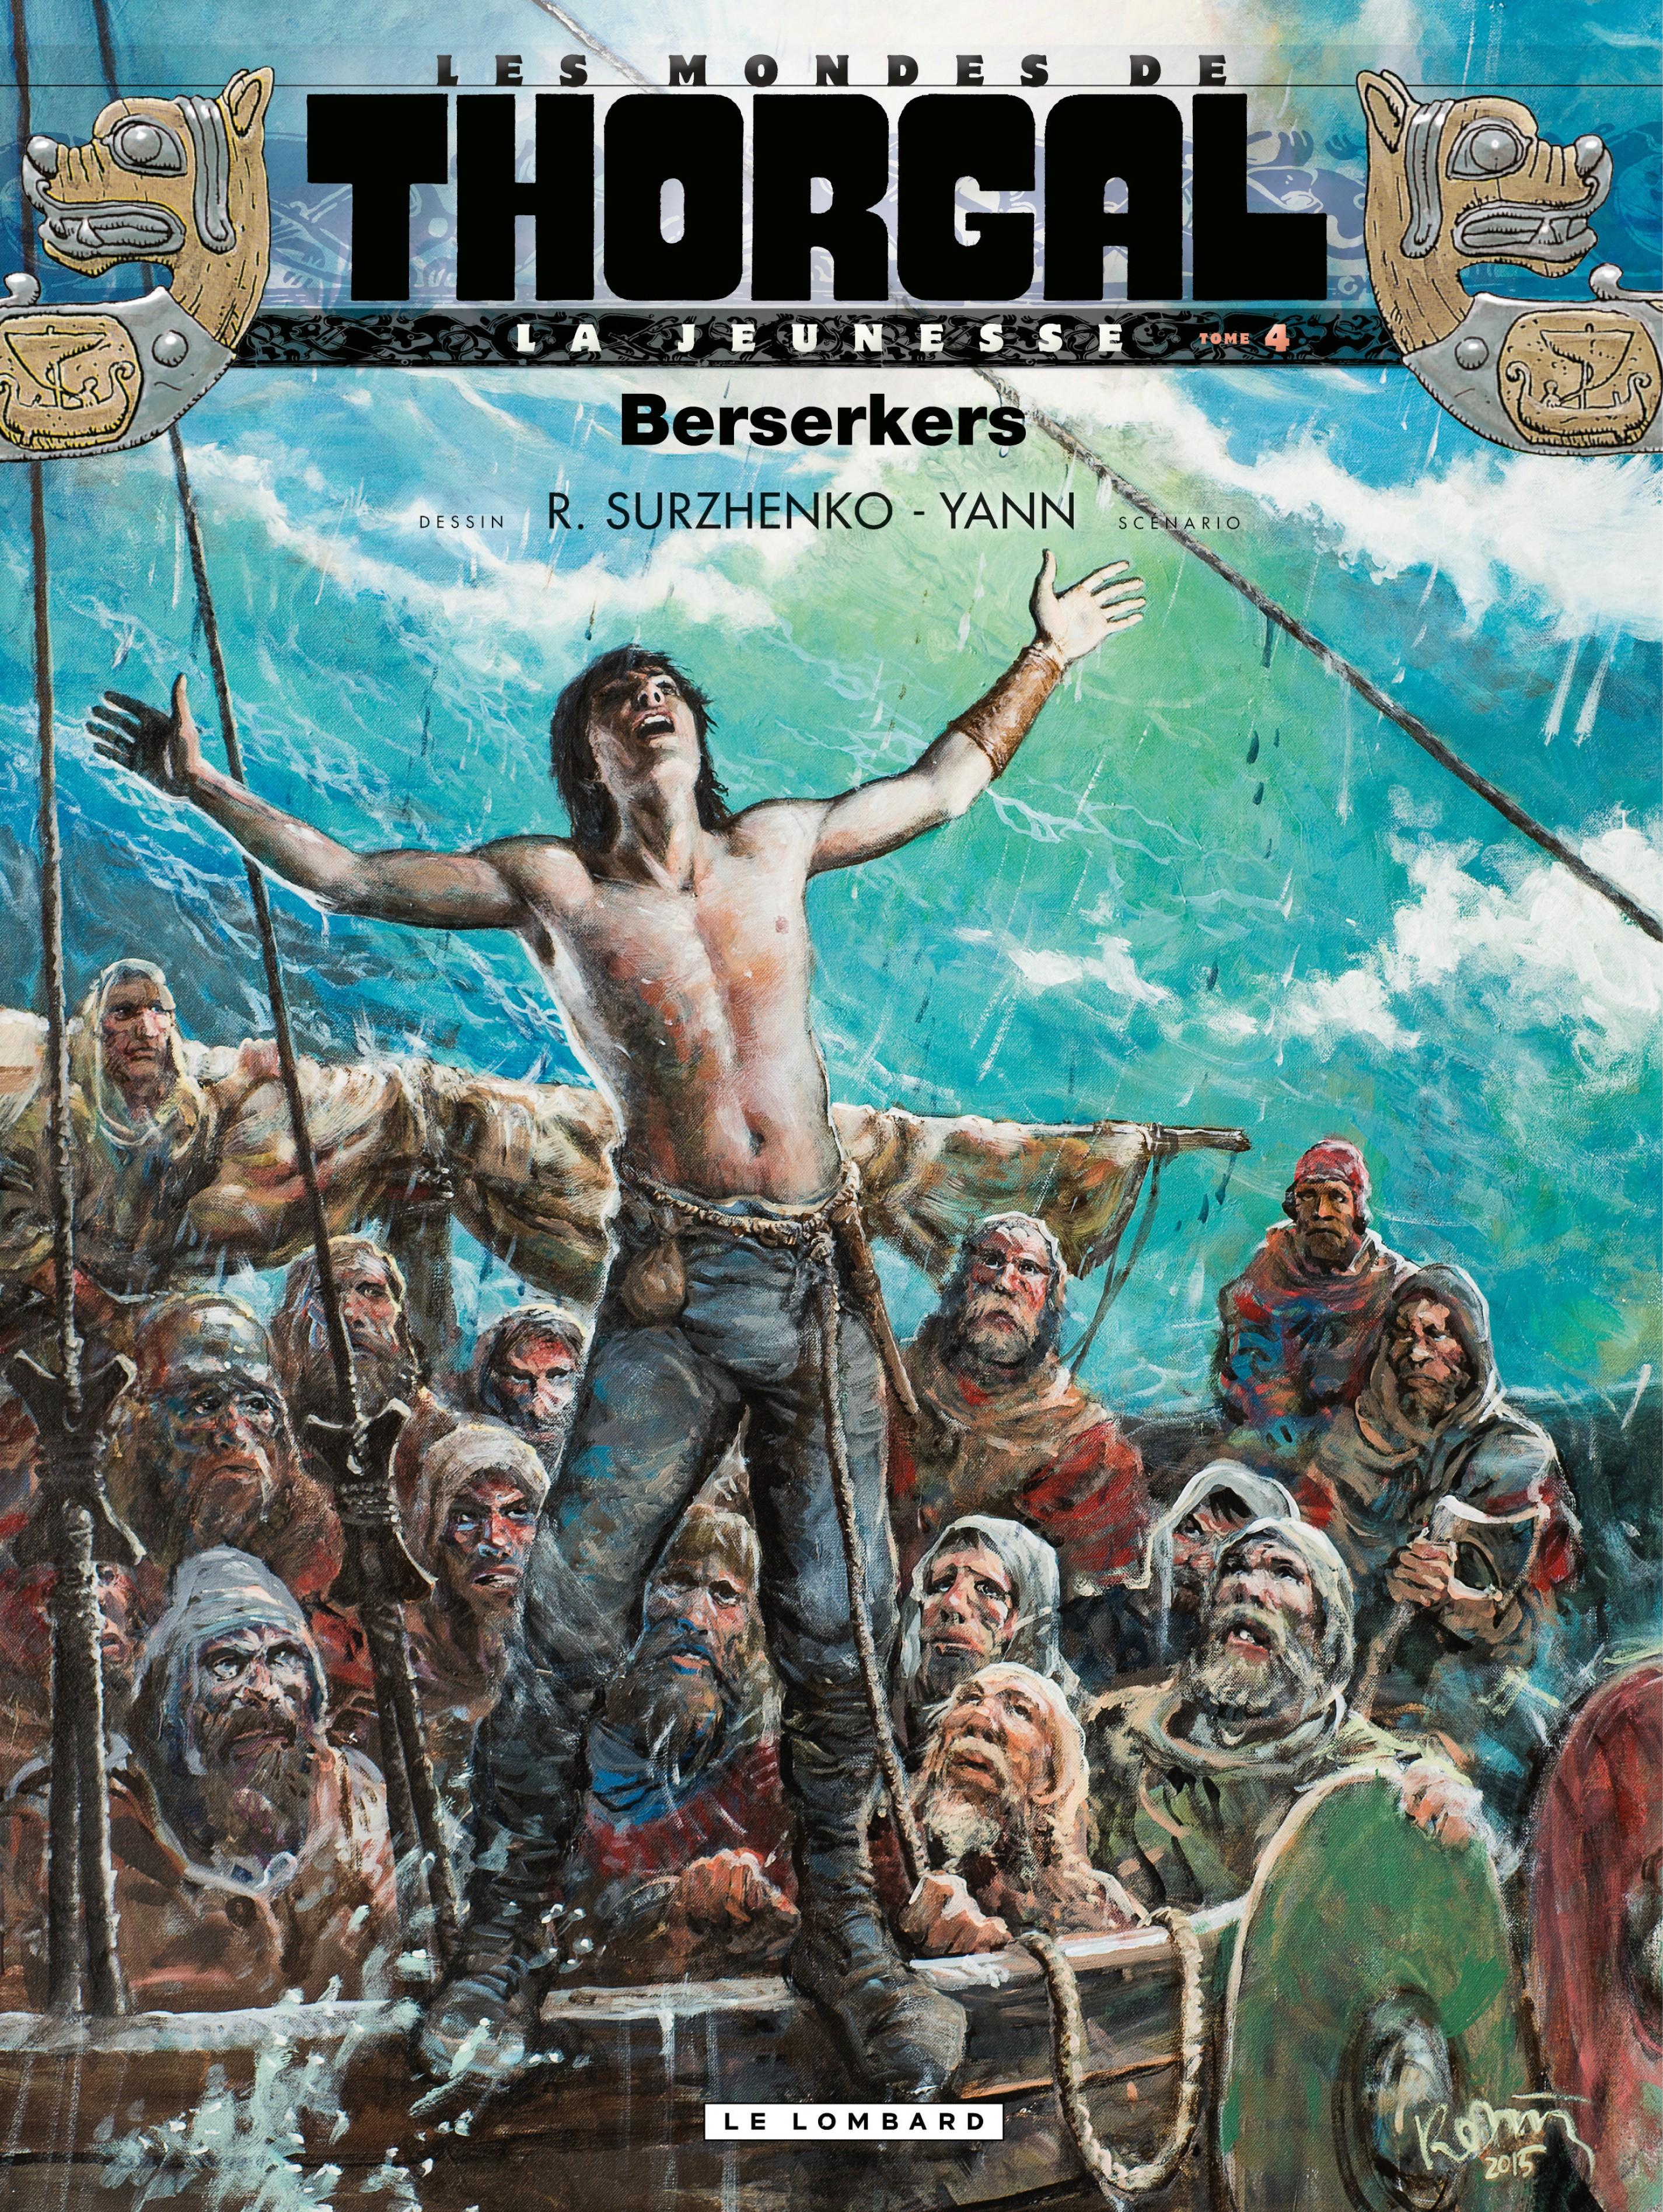 La Jeunesse de Thorgal - Tome 4 - Berserkers